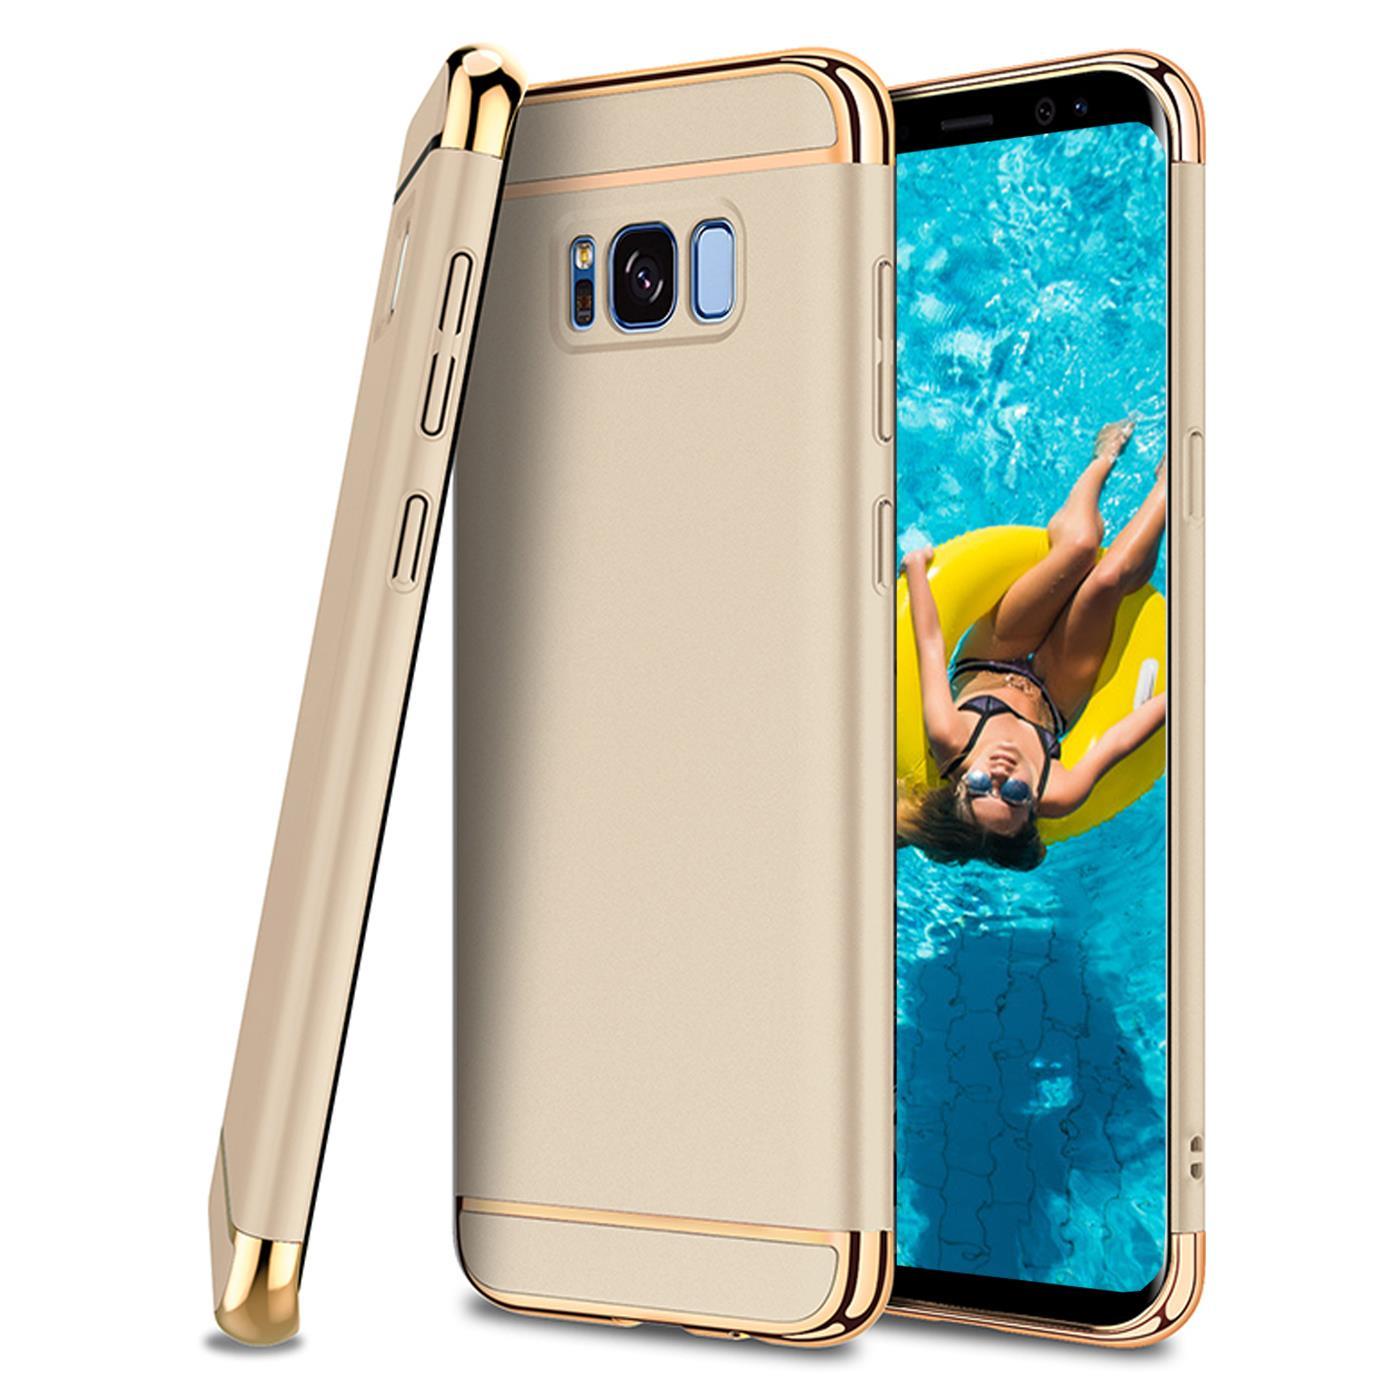 Samsung-Galaxy-S8-Hard-Back-Case-Cover-Thin-Bumper-Slim-Shockproof-Rugged-Thin thumbnail 5